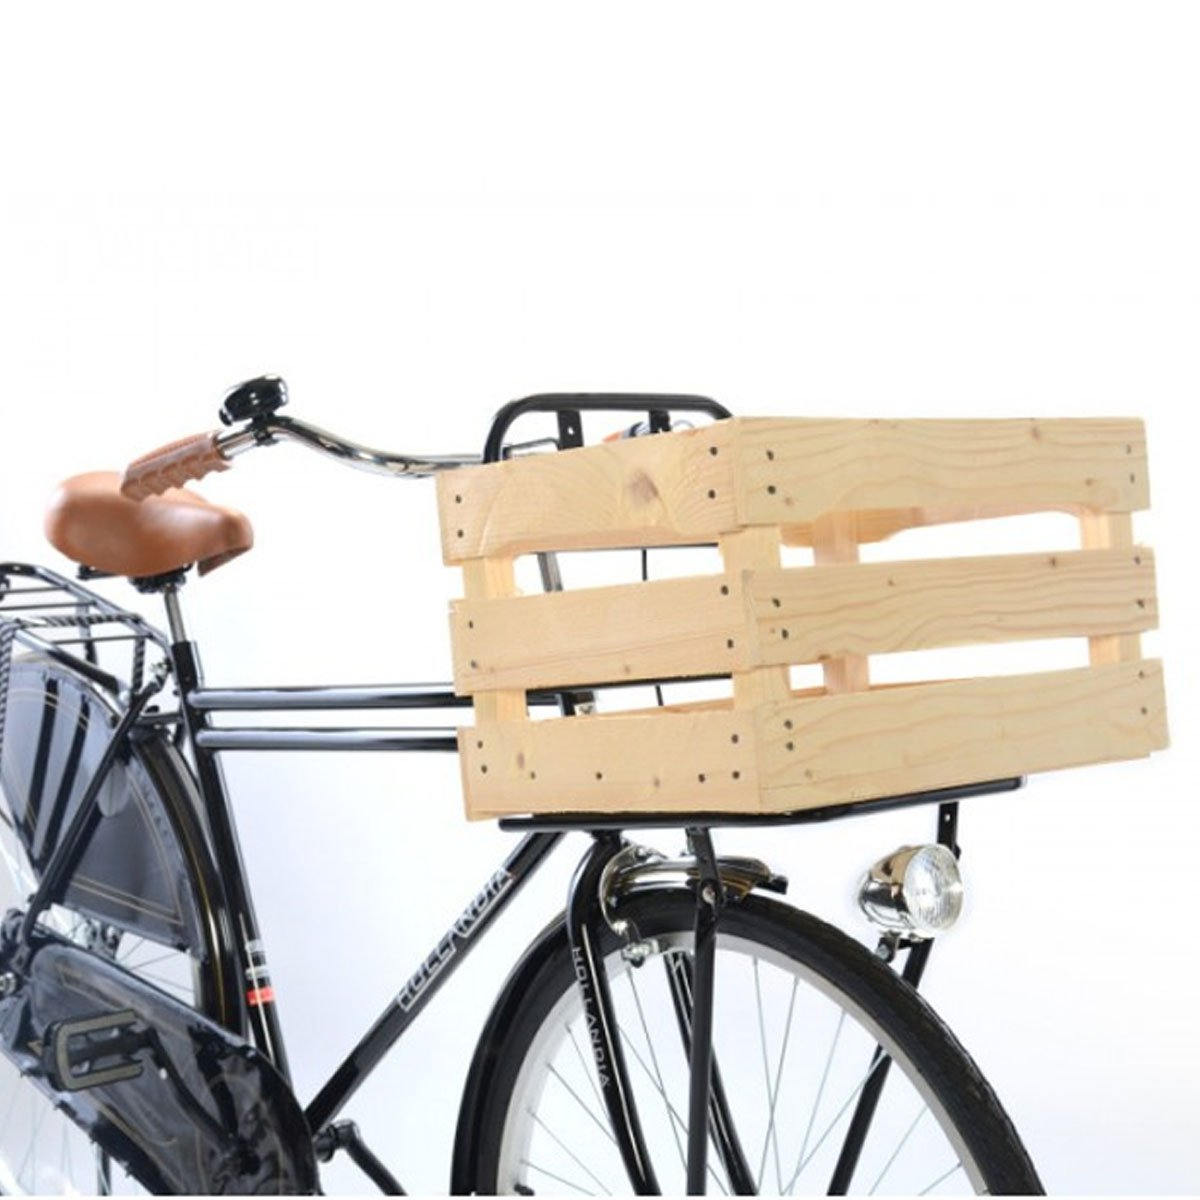 Hollandia Wooden Carrier Box, Natural Wood by Hollandia   B01FWQ9JDA